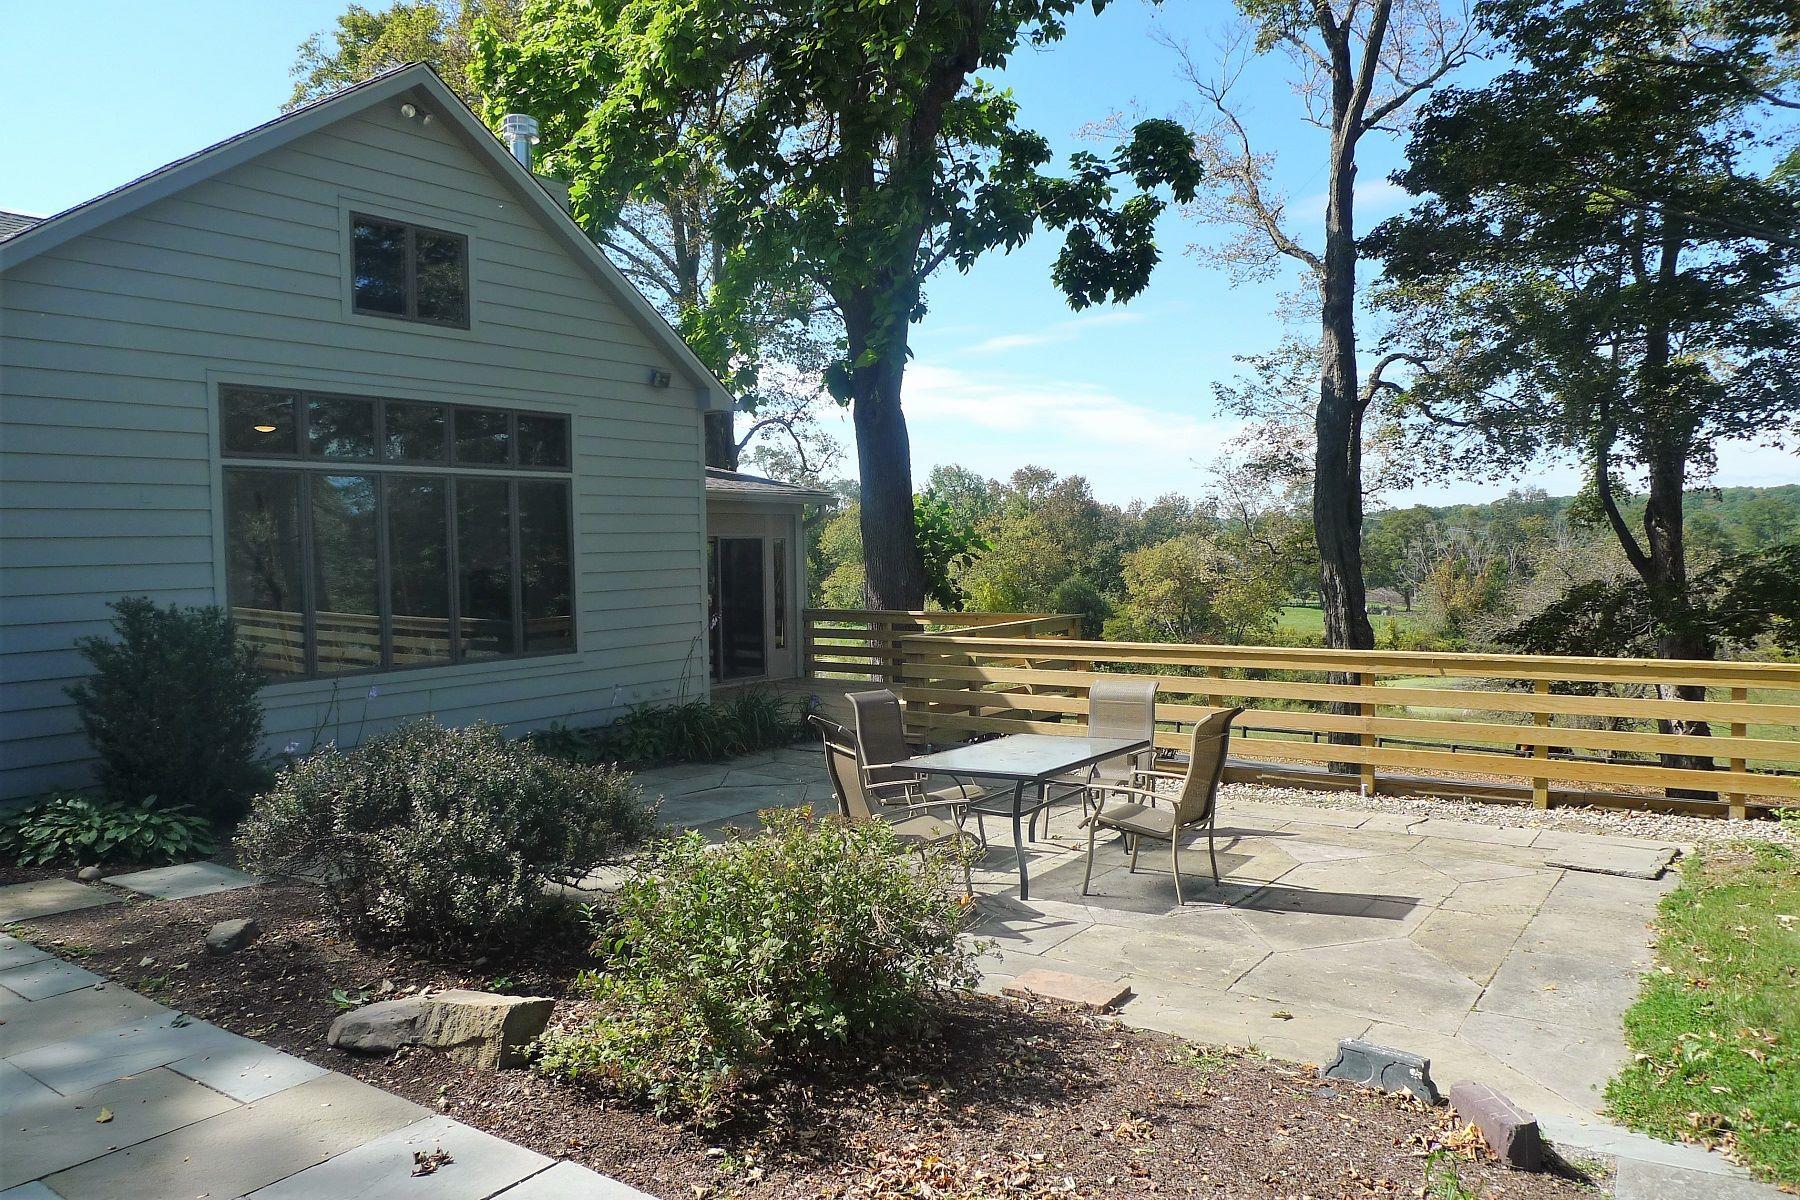 独户住宅 为 销售 在 Browning Road Farmhouse 11 Browning Road Hyde Park, 纽约州 12538 美国